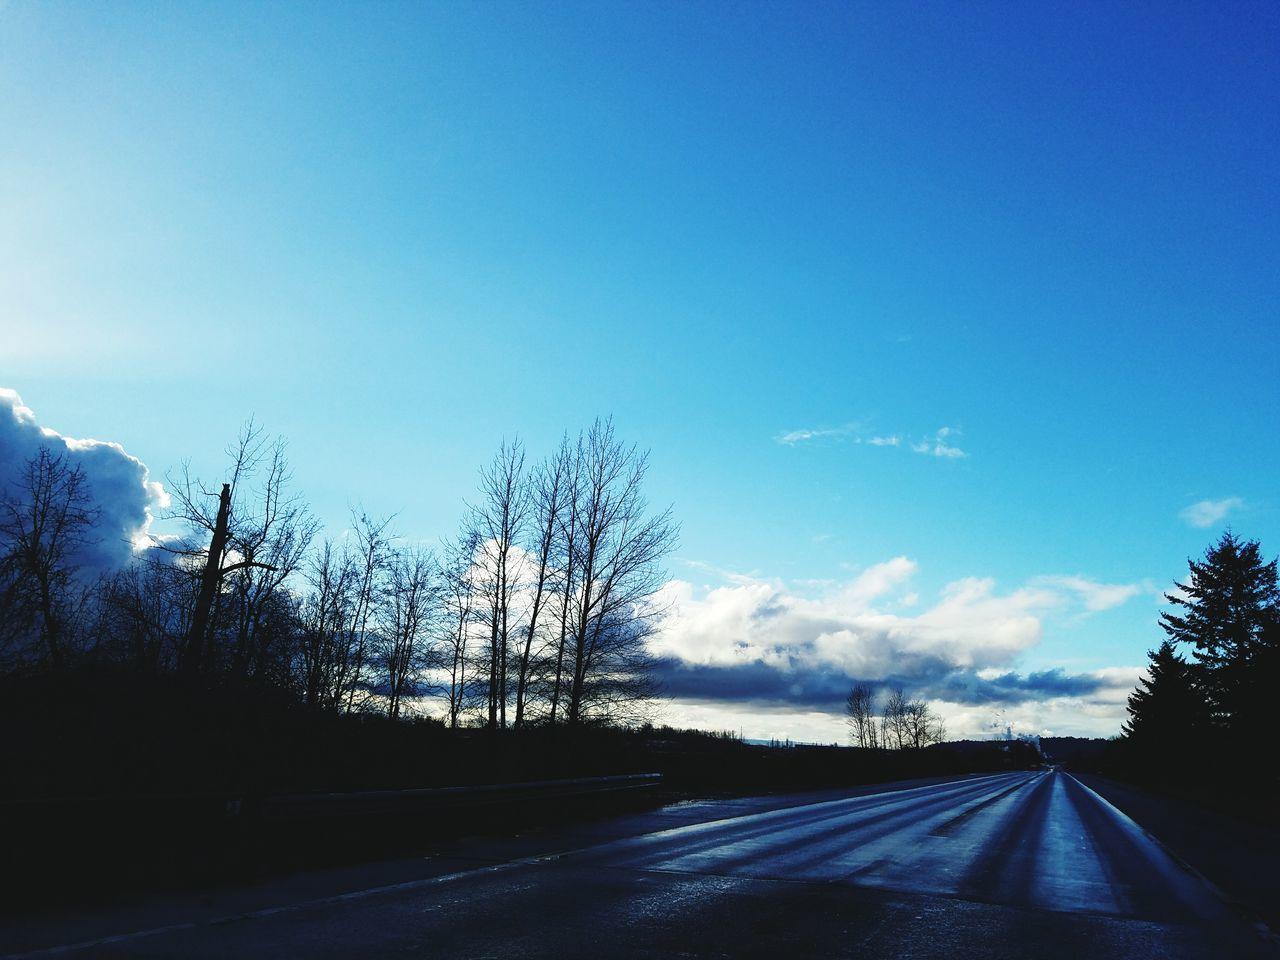 Sky No People Tree Outdoors Road Cloud - Sky Dramatic Sky Scenics Roadscenes